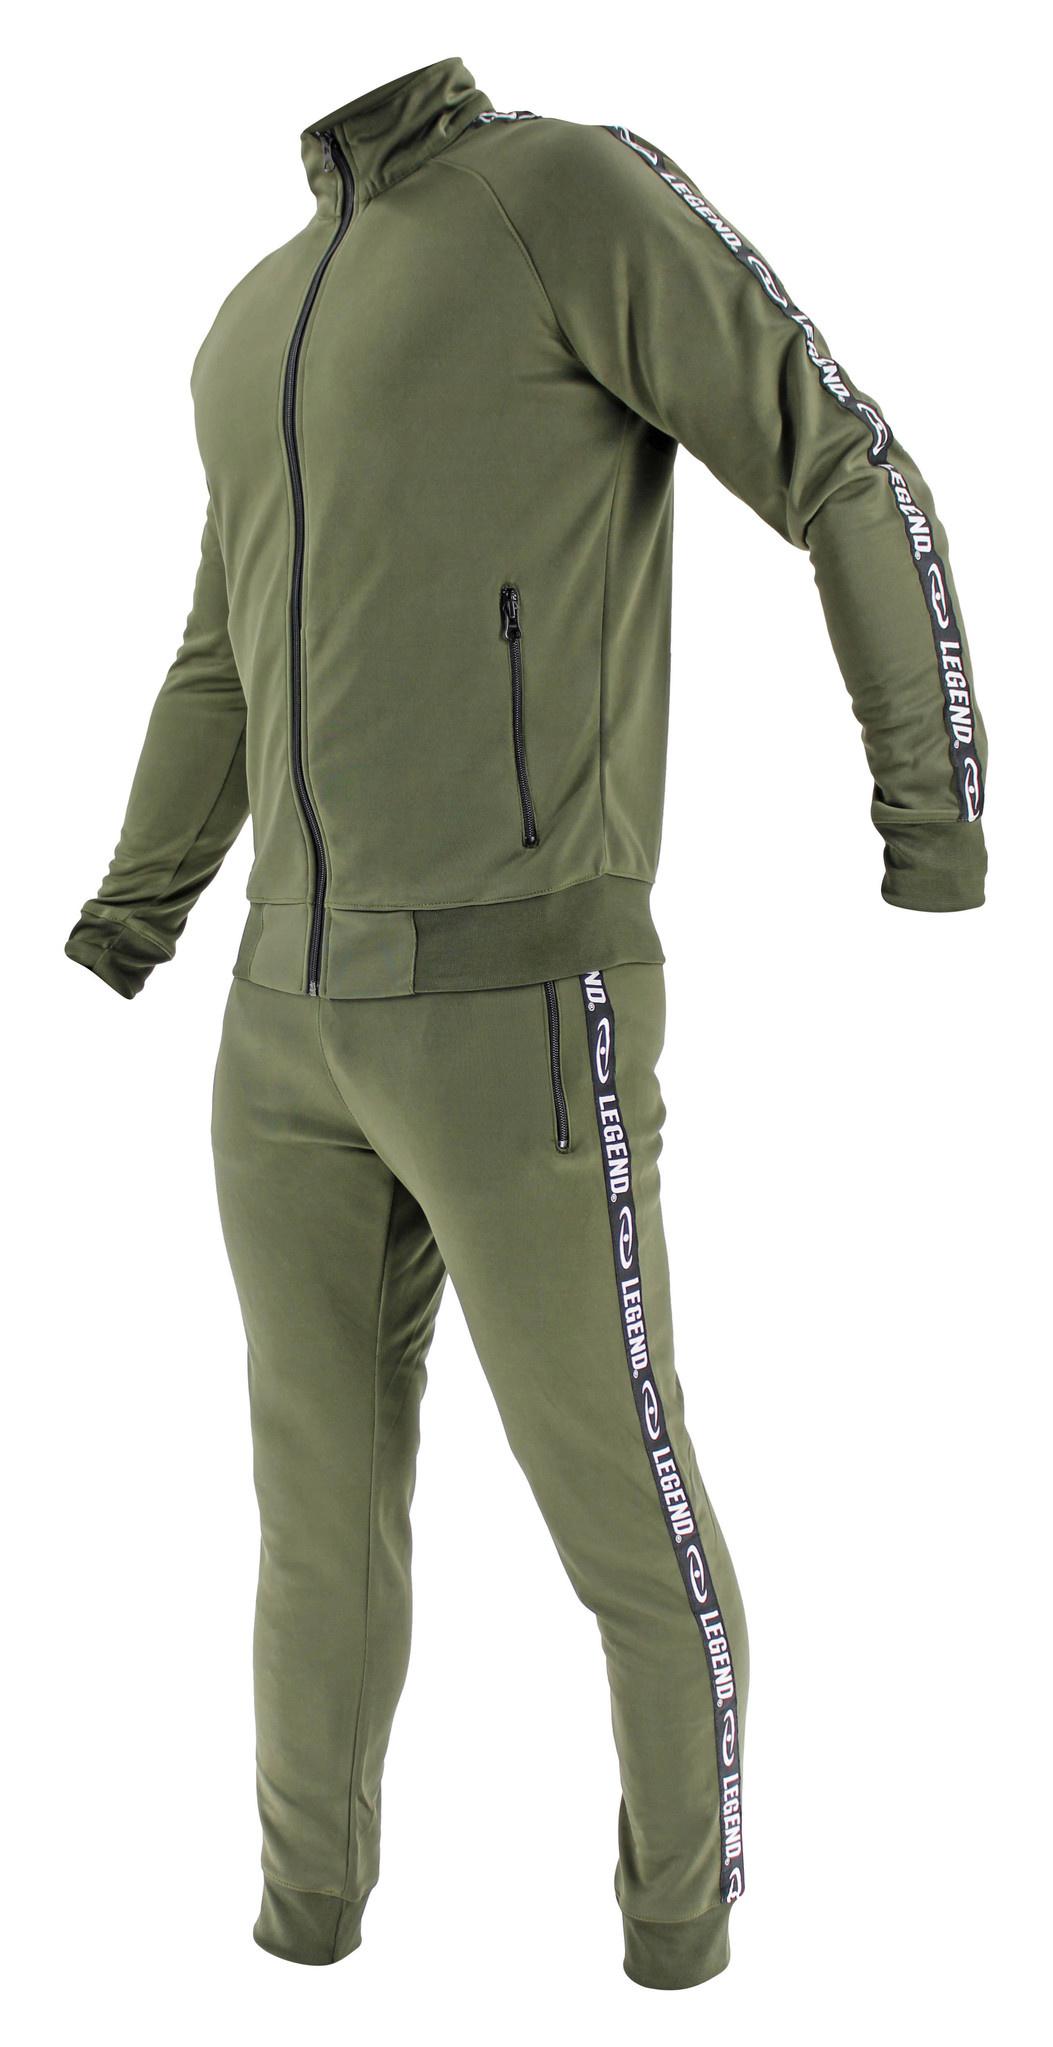 Legend B-keuzeTrainingspak Unisex SlimFit Army Green